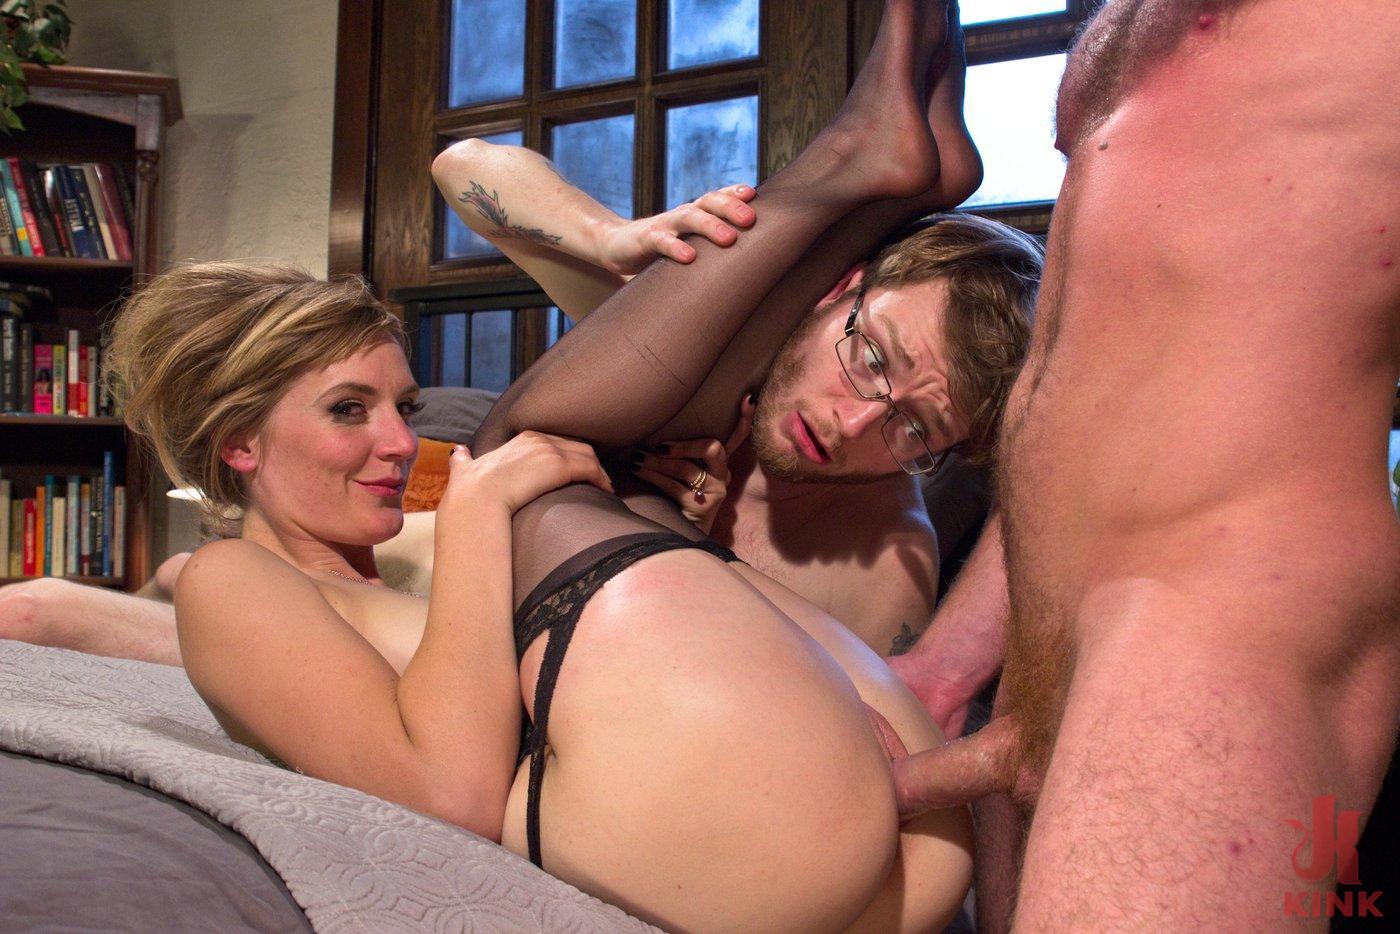 Wife humiliation porn